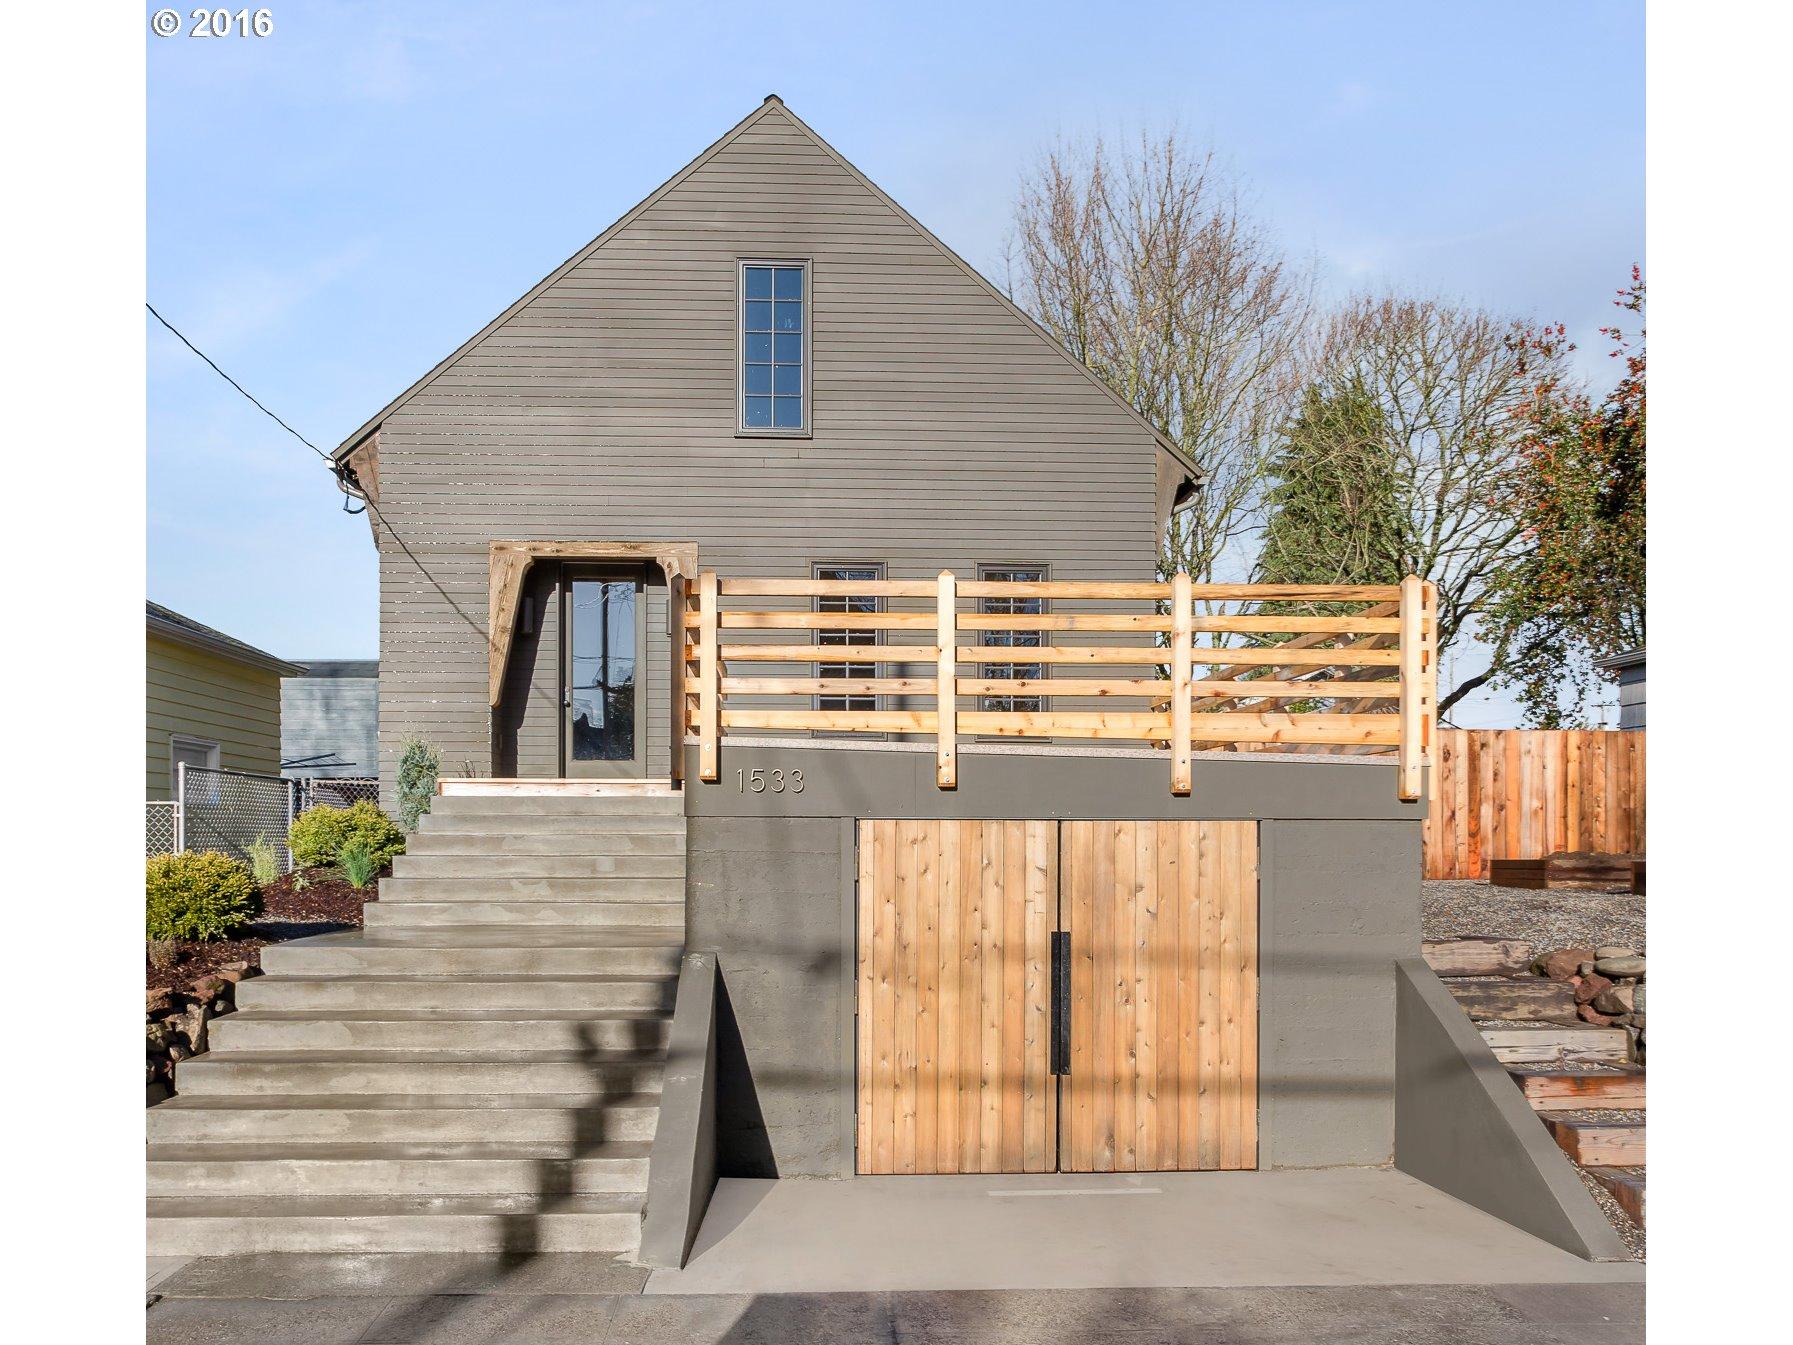 Property for sale at 1533 N JARRETT ST, Portland,  OR 97217